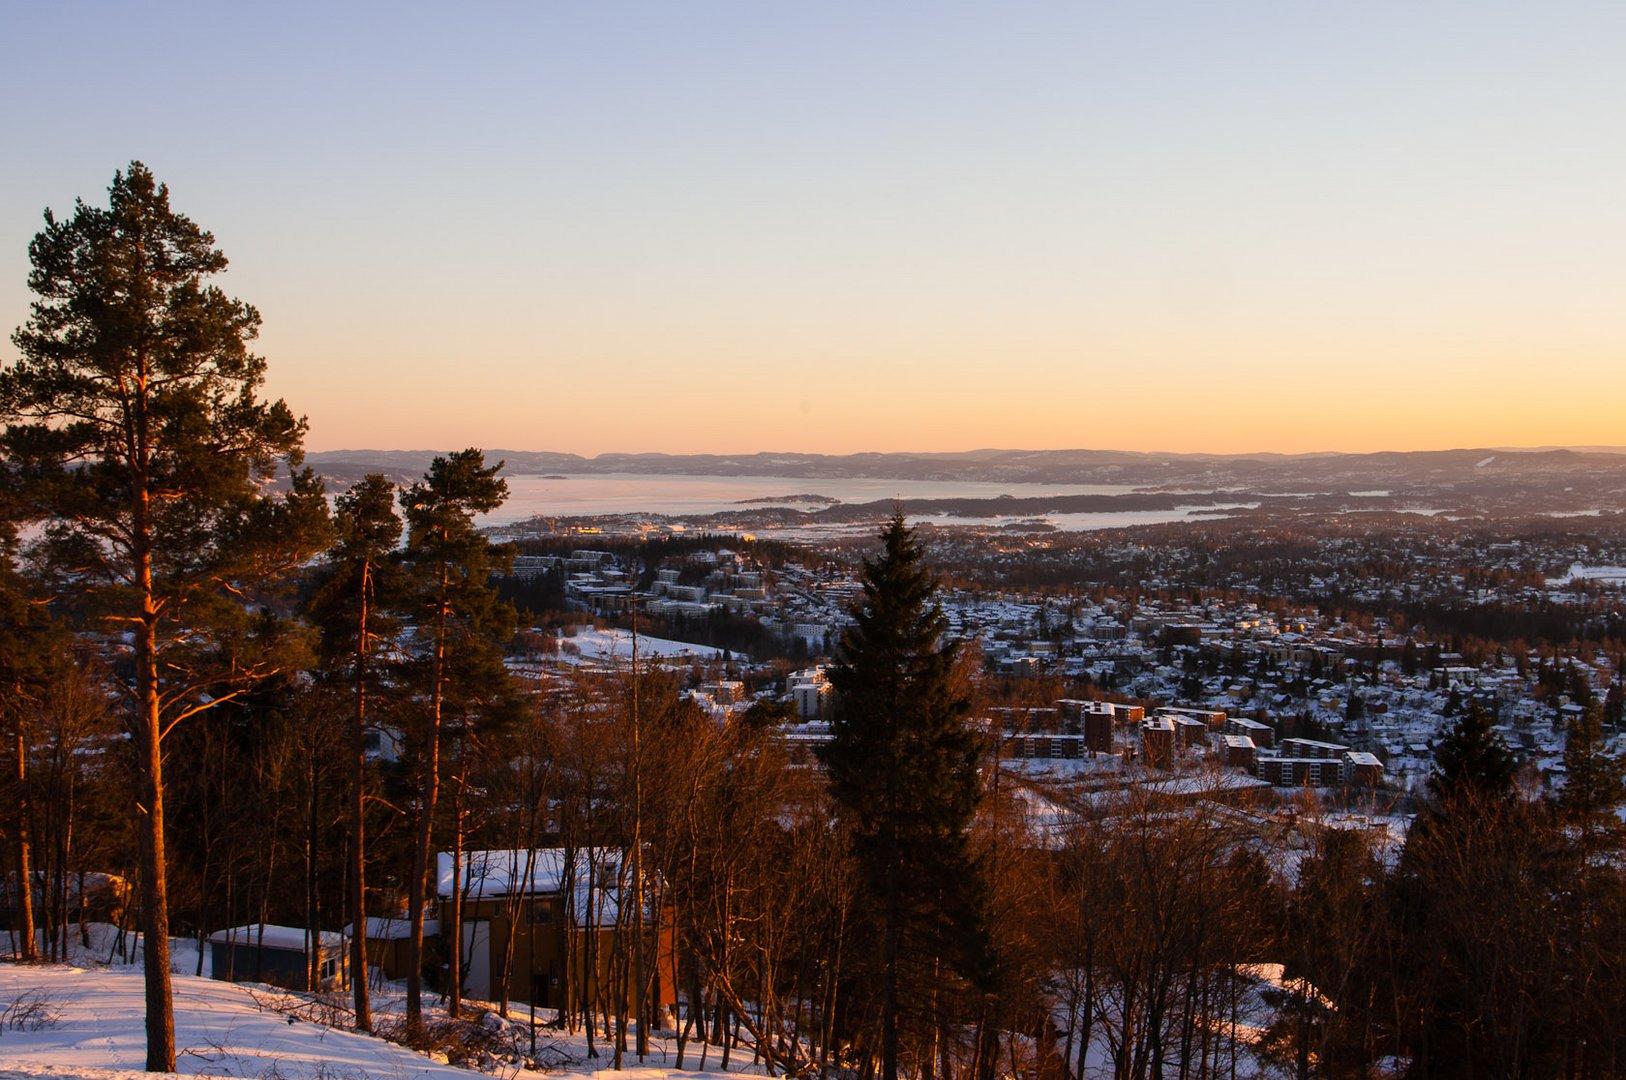 Oslo / Fjord